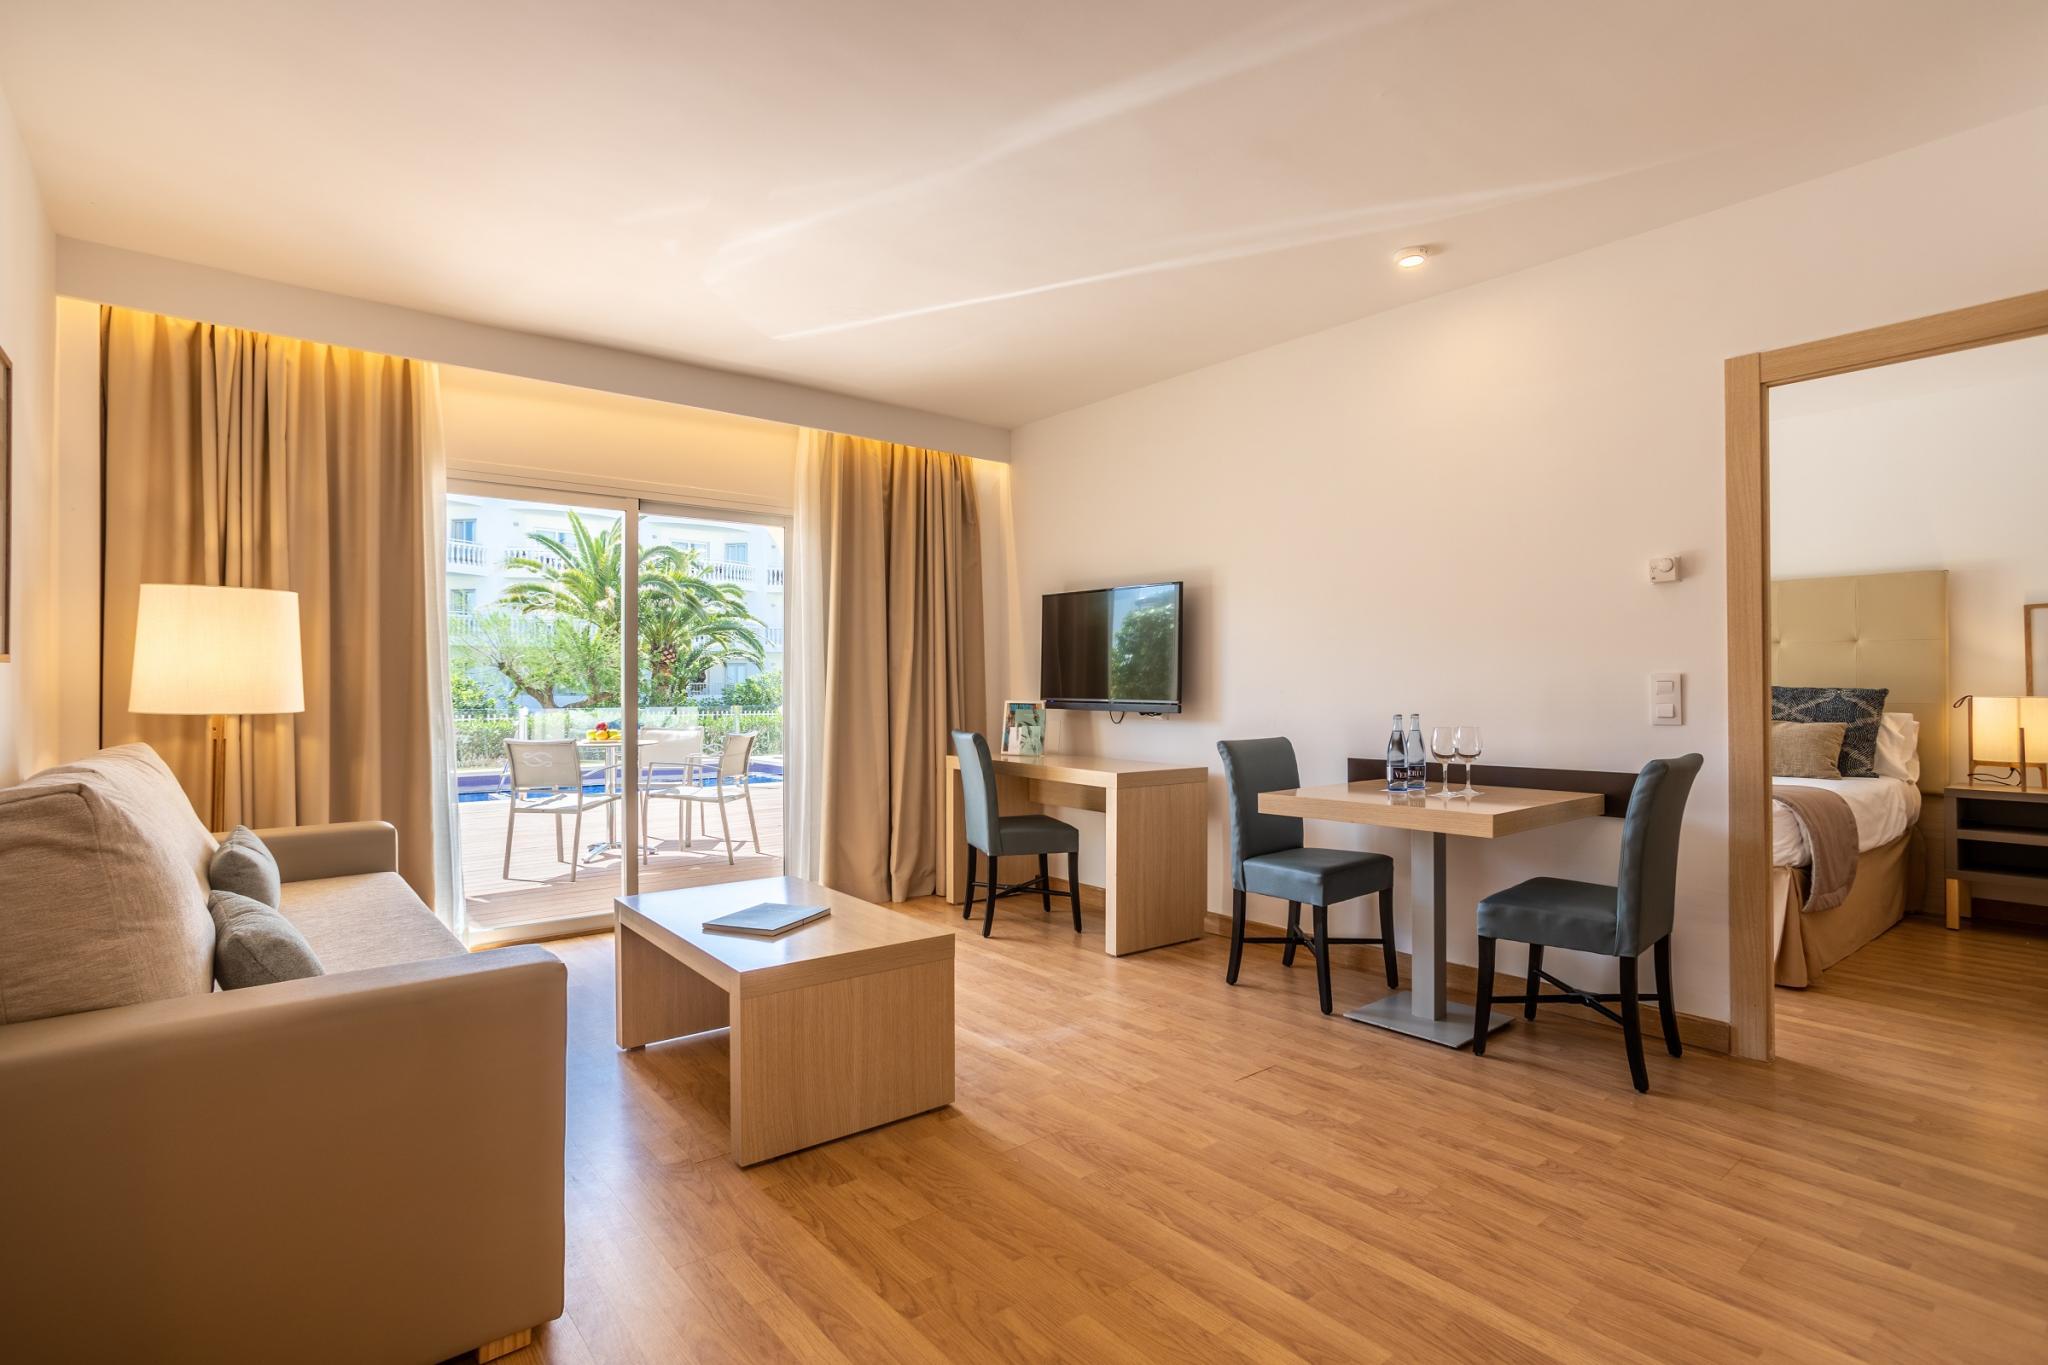 Zimmer hotel zafiro bahia bilder und zimmerausstattung for Zimmerausstattung hotel